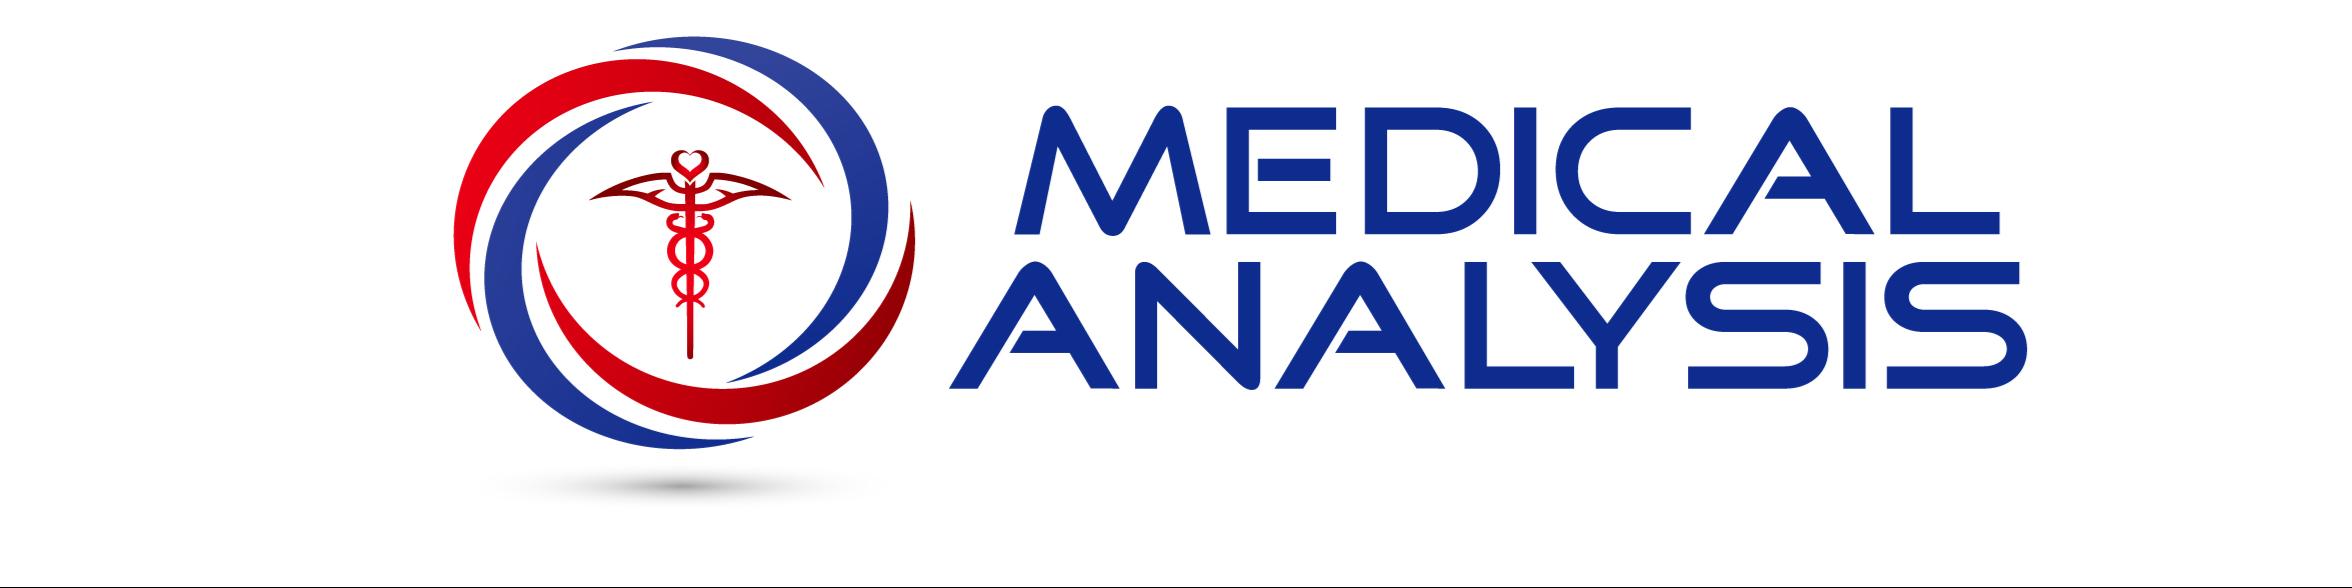 Medical Analysis Telemedicine Family Medicine Biloxi Ms